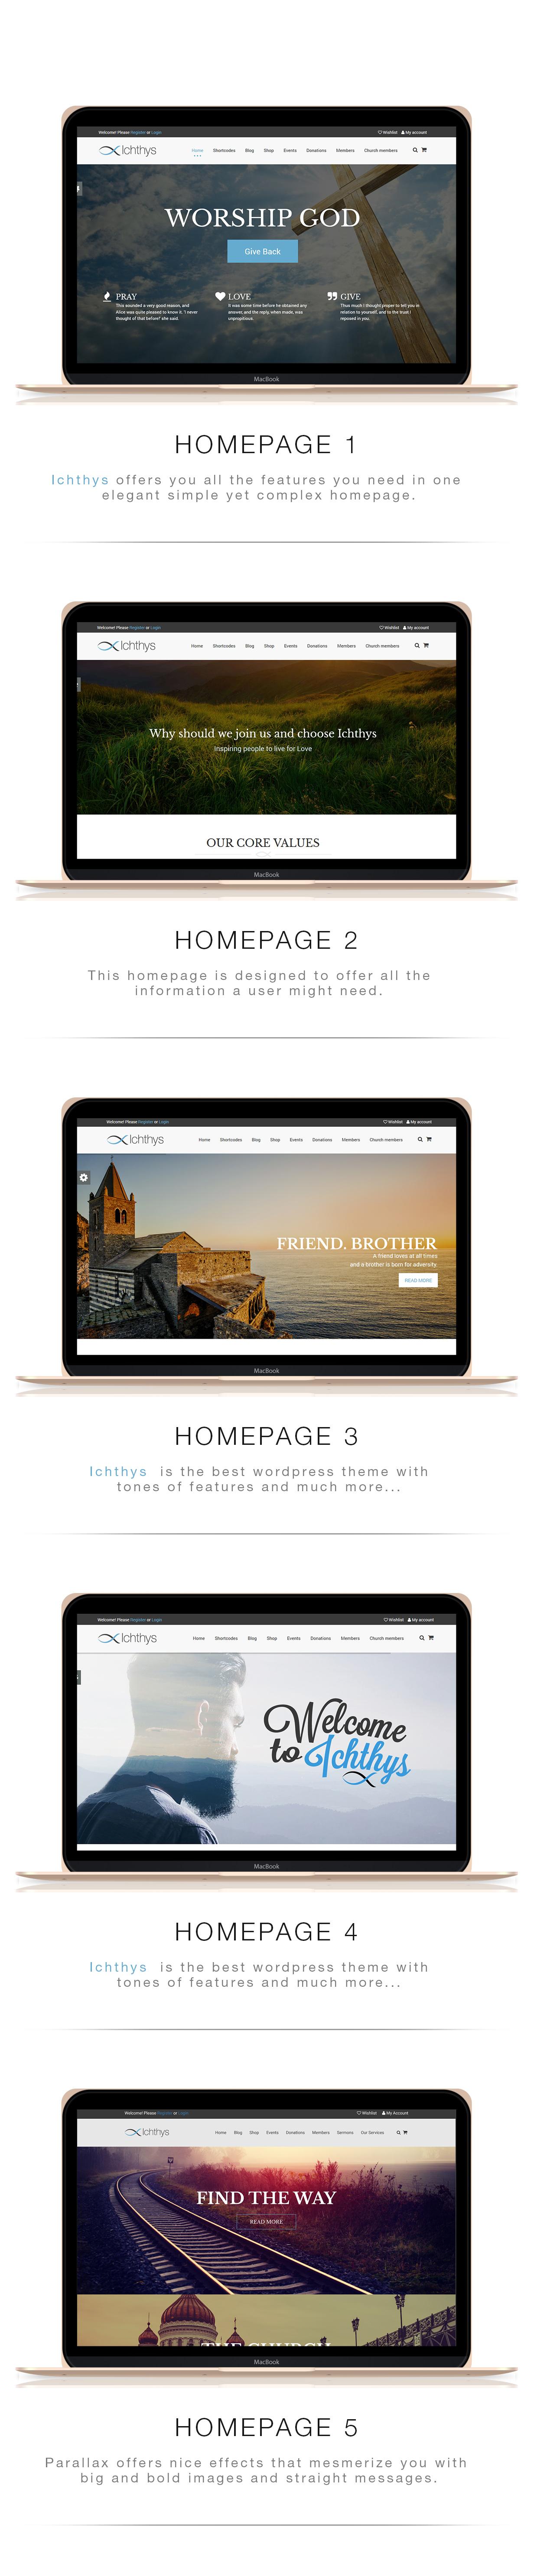 Ichthys - Church WordPress Theme - 5